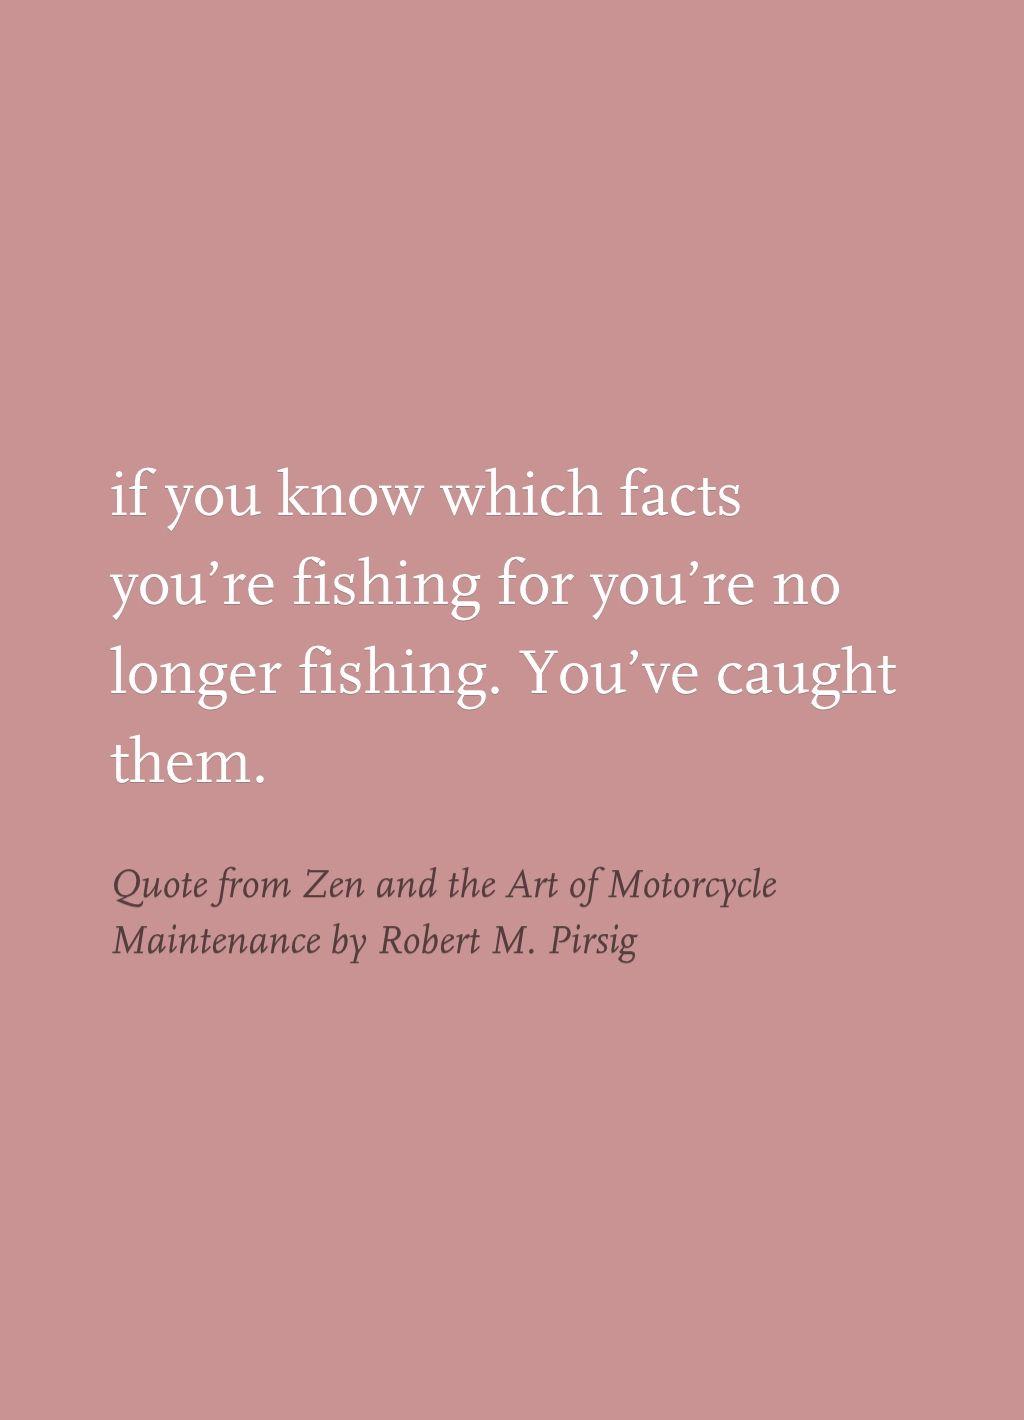 zen and the art of motorcycle maintenance pirsig robert m